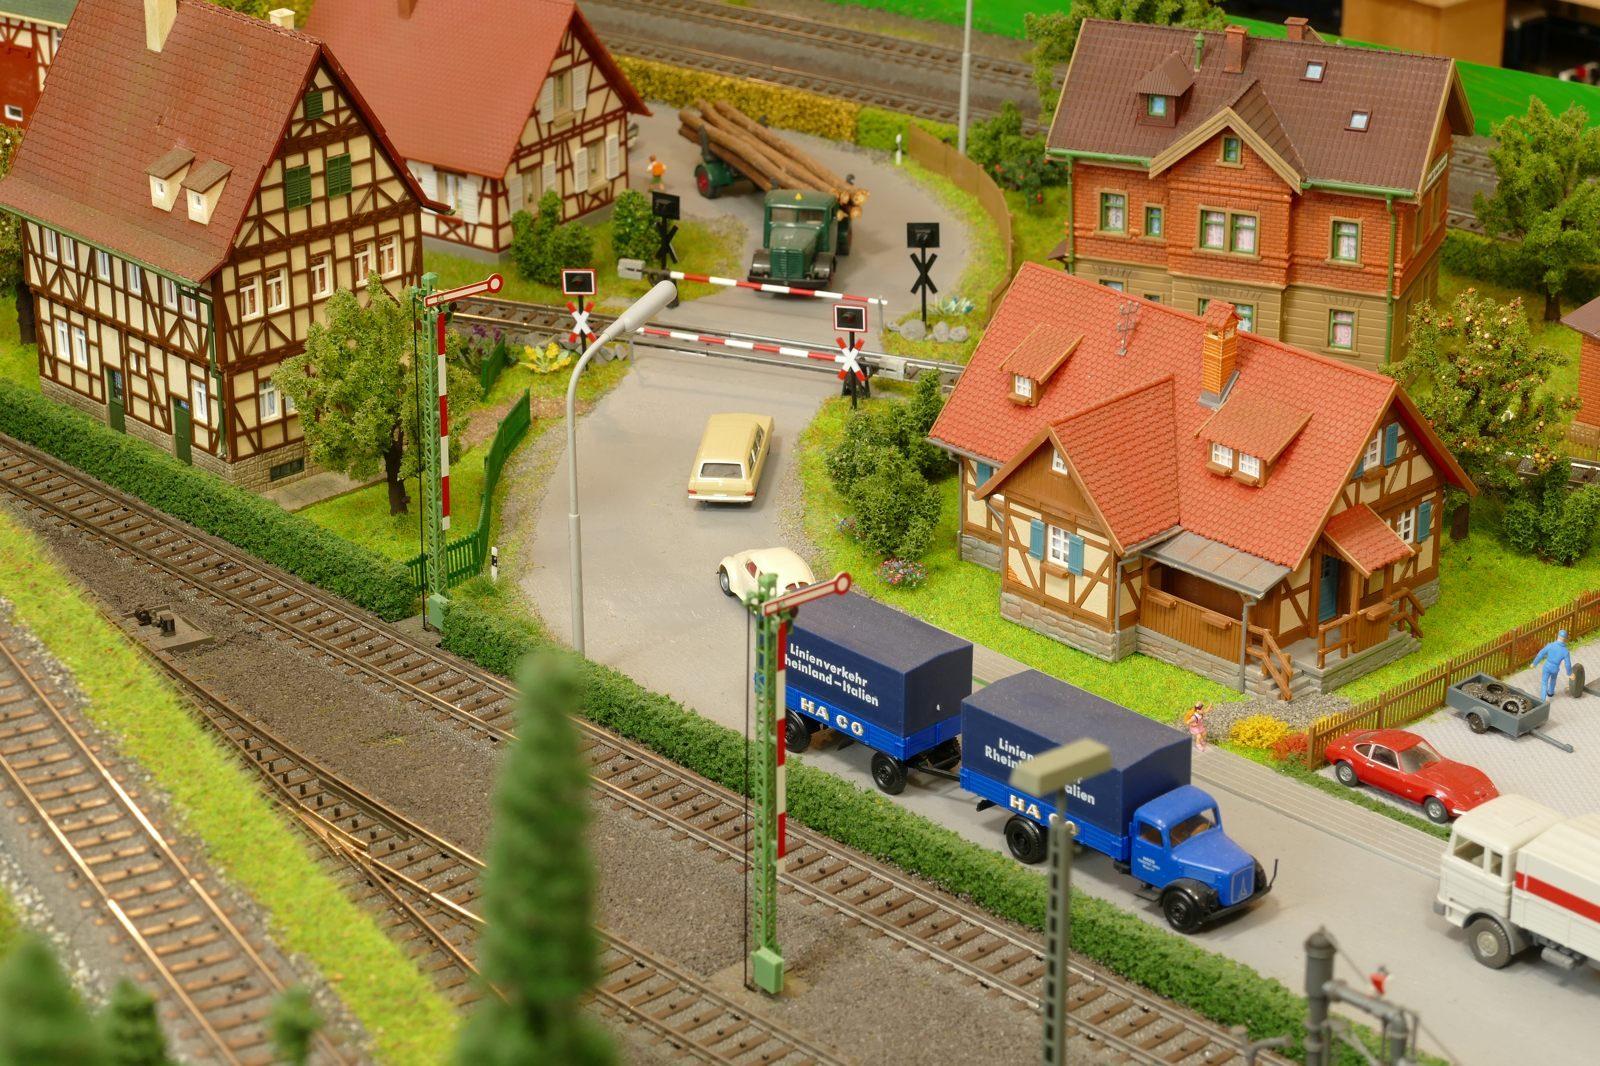 Bahnübergang Bahnhofstraße